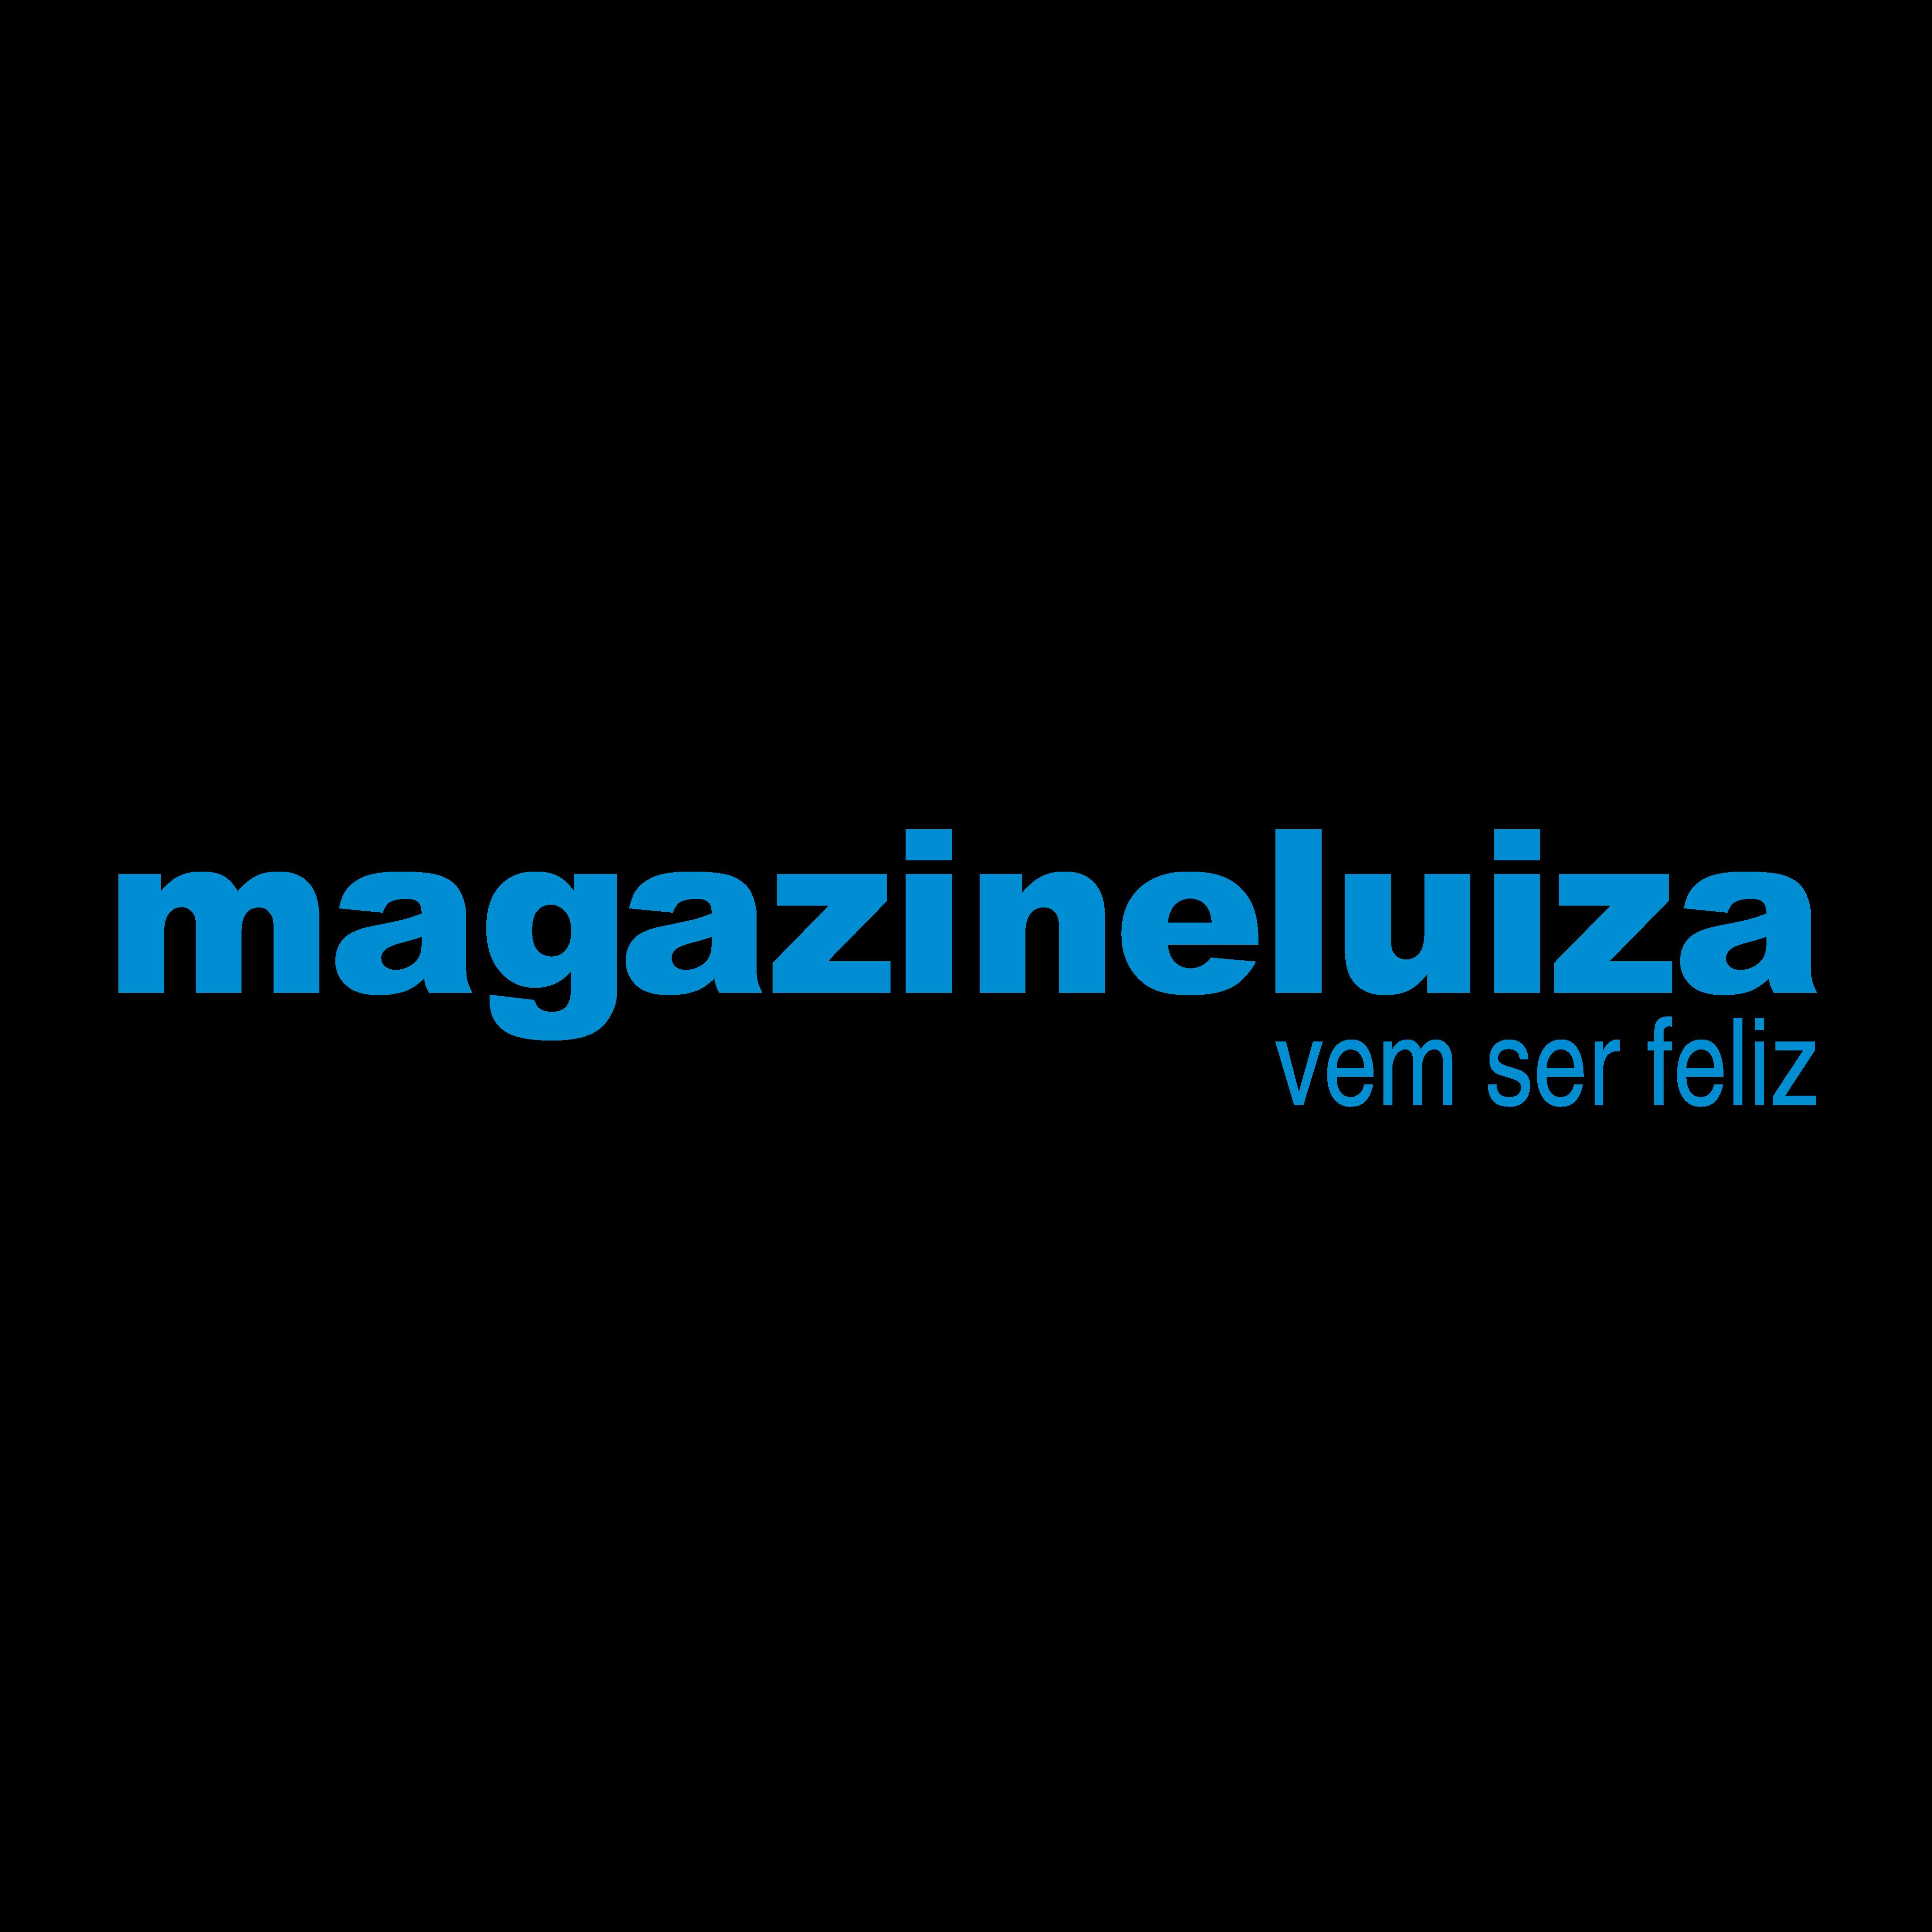 foto de Logo Magazine Luiza Logos PNG